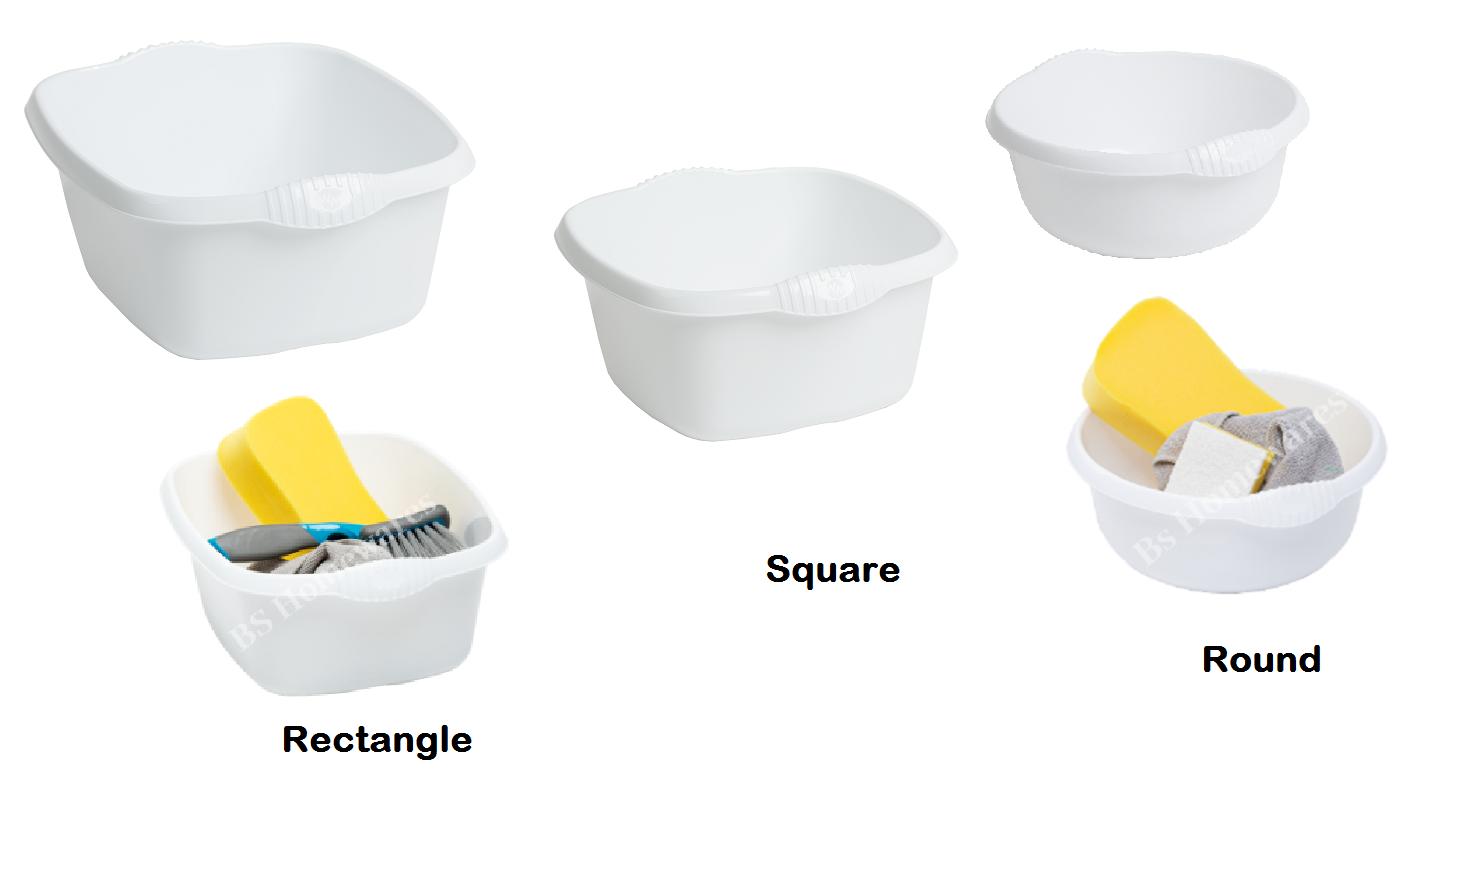 Wham Plastic Round Bowls Kitchen Sink,Basin Mixing,Washing Up Bowl Tidy Organizer Cream//Calico, 28cm Round Bowl